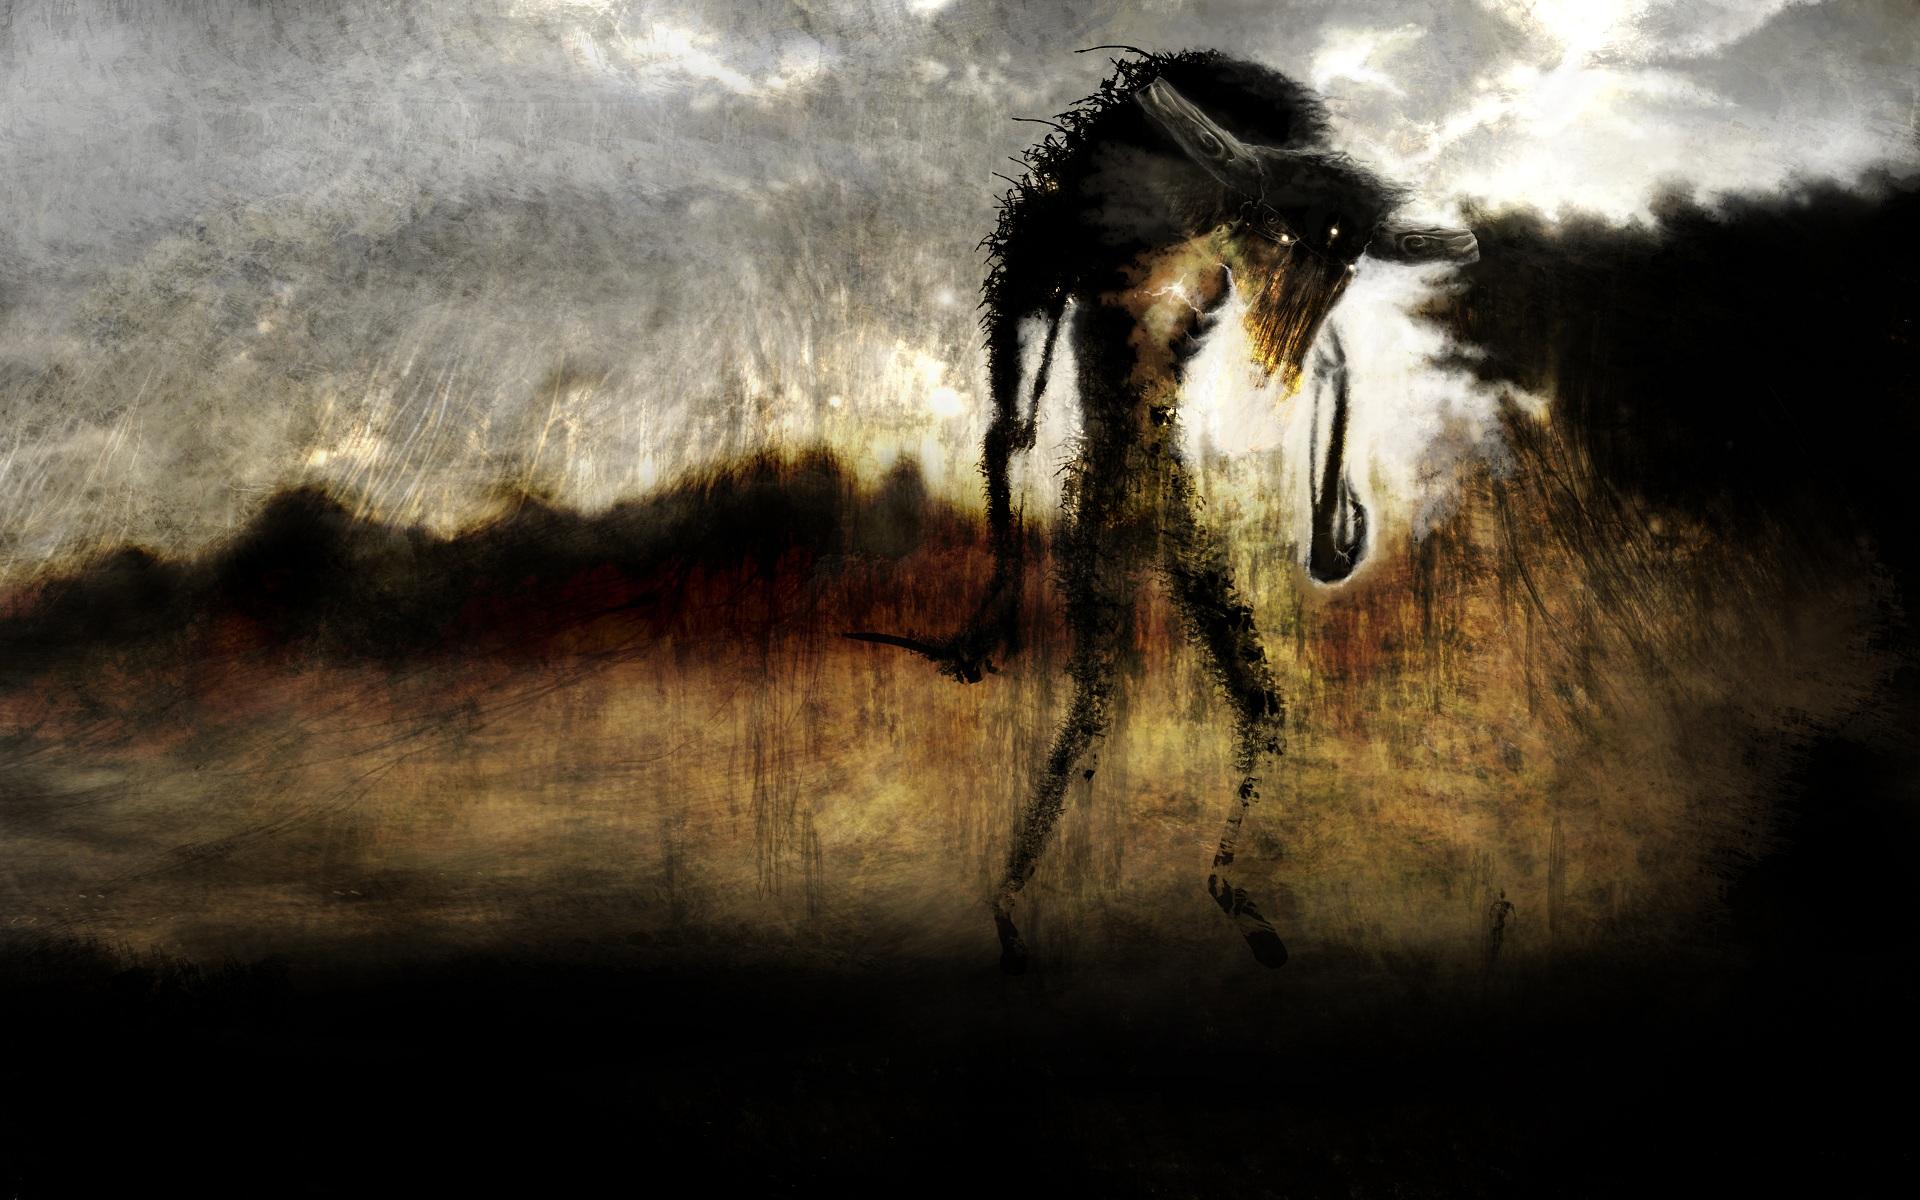 Space Demonic Art Hd Wallpaper: Demon HD Wallpaper